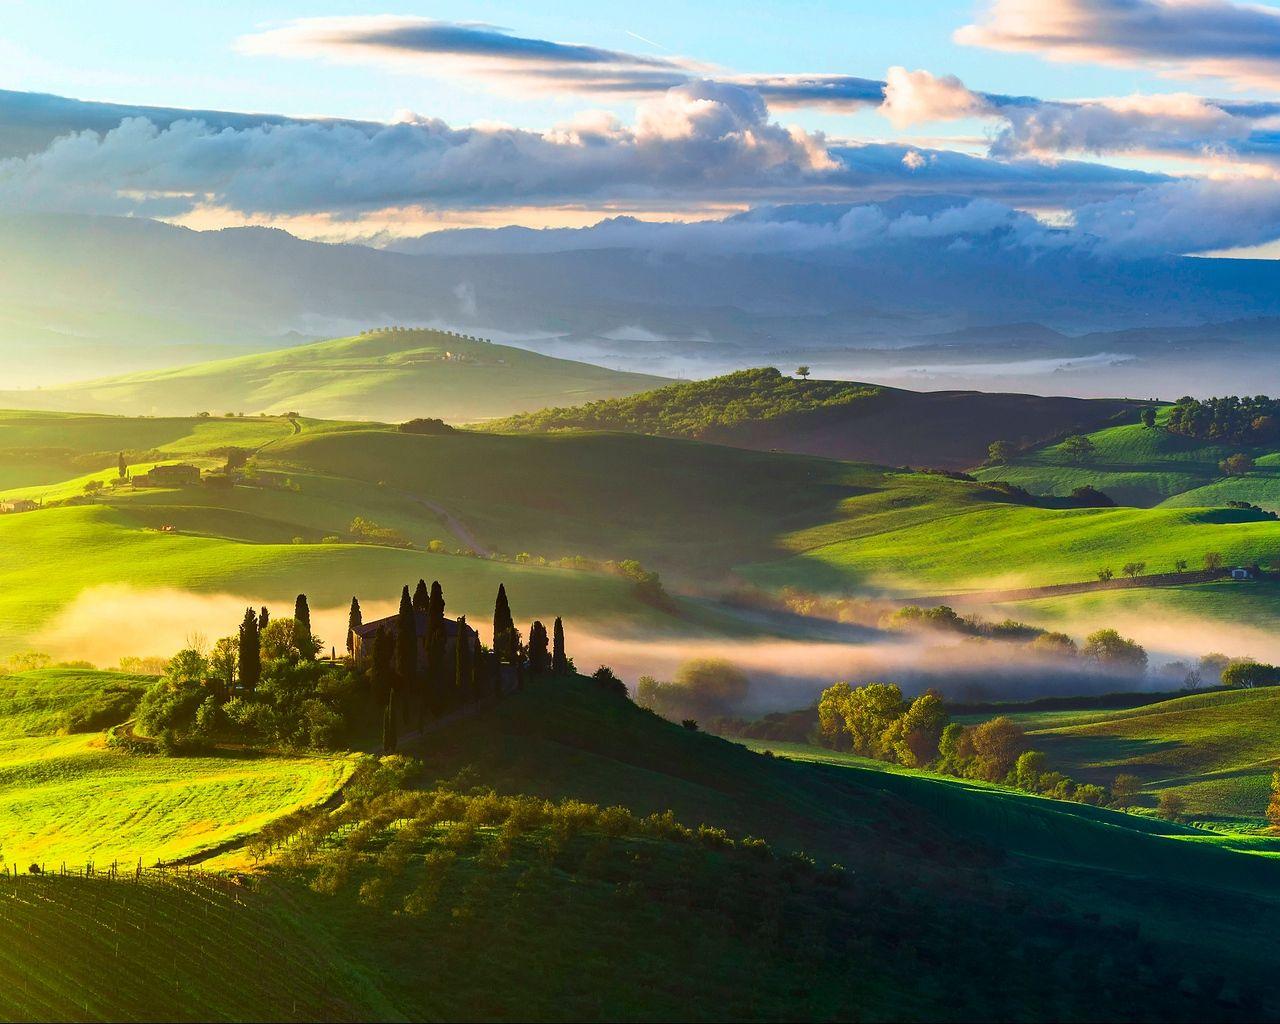 Italy Tuscany Field 1280x1024 Italy Landscape Landscape Wallpaper Nature Wallpaper